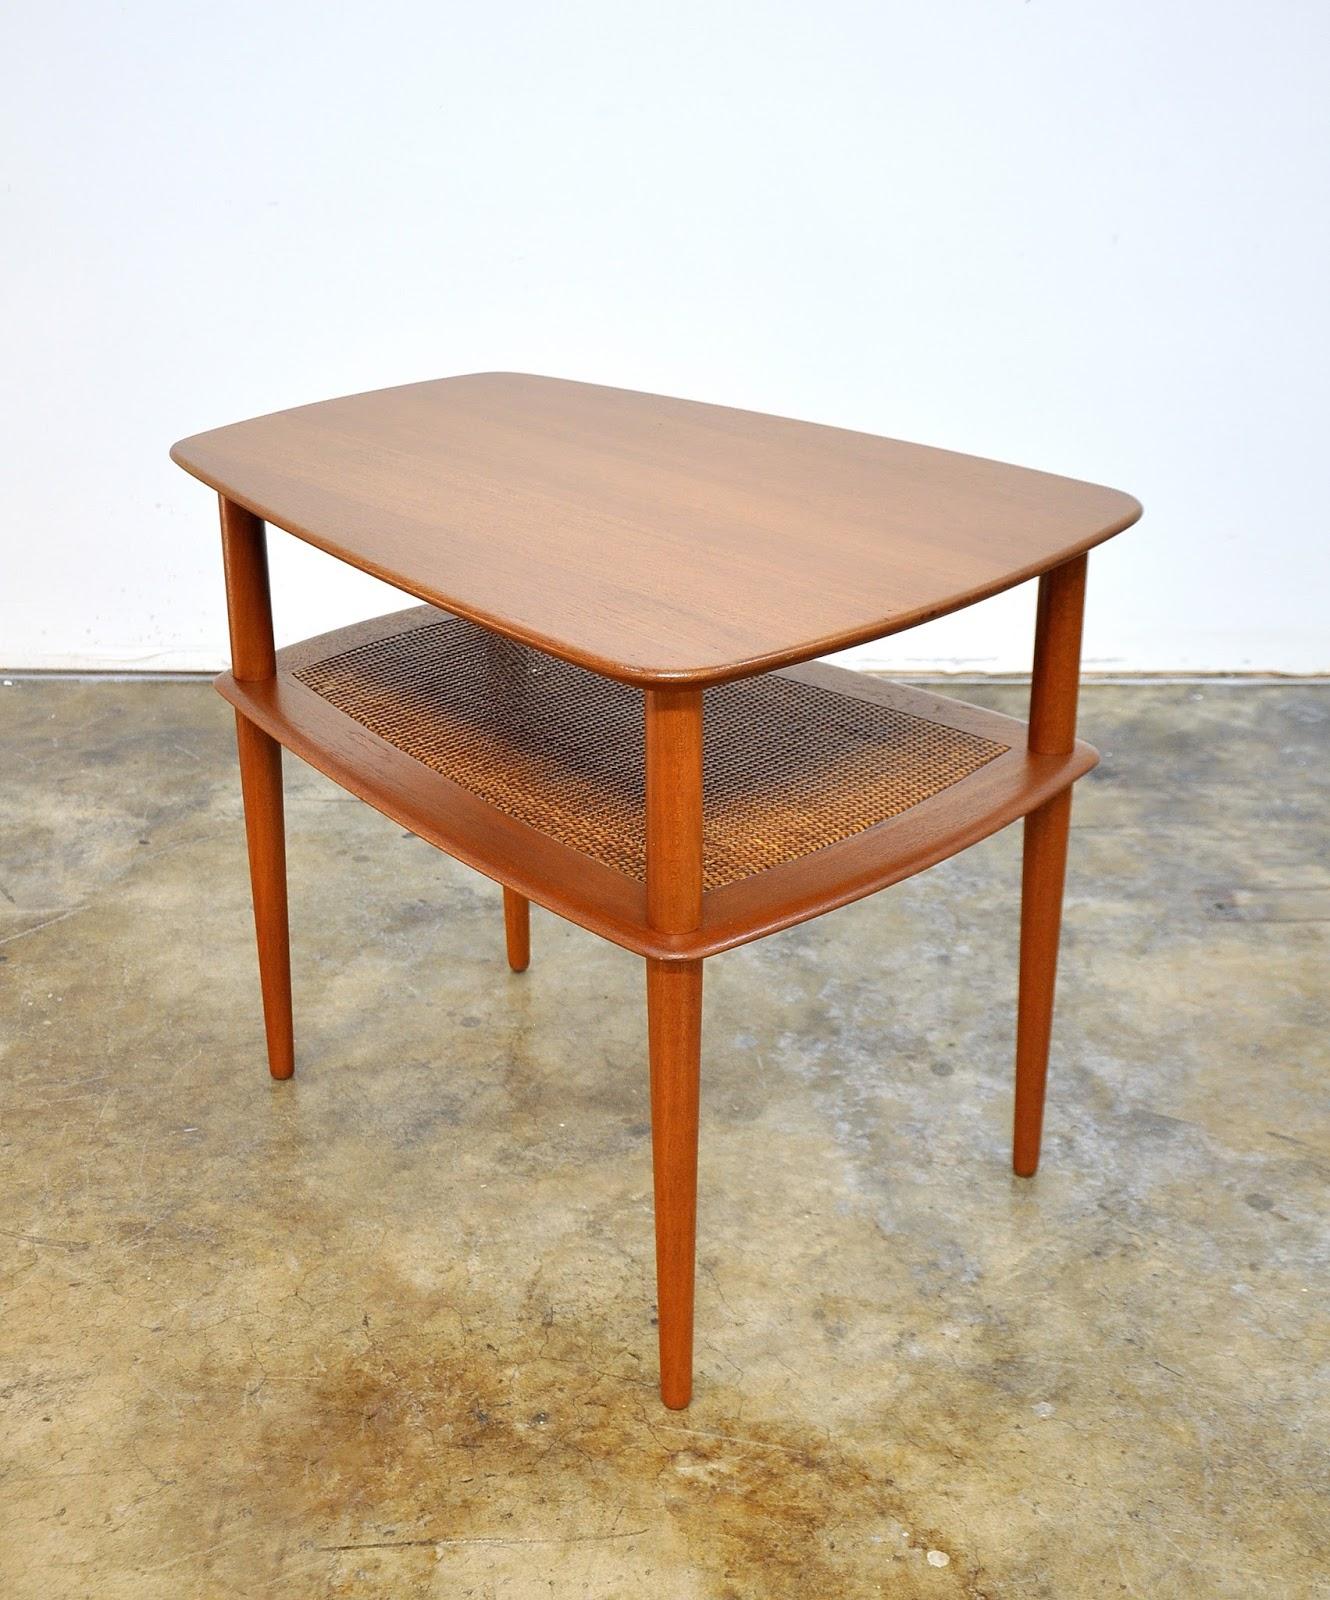 france l1 table